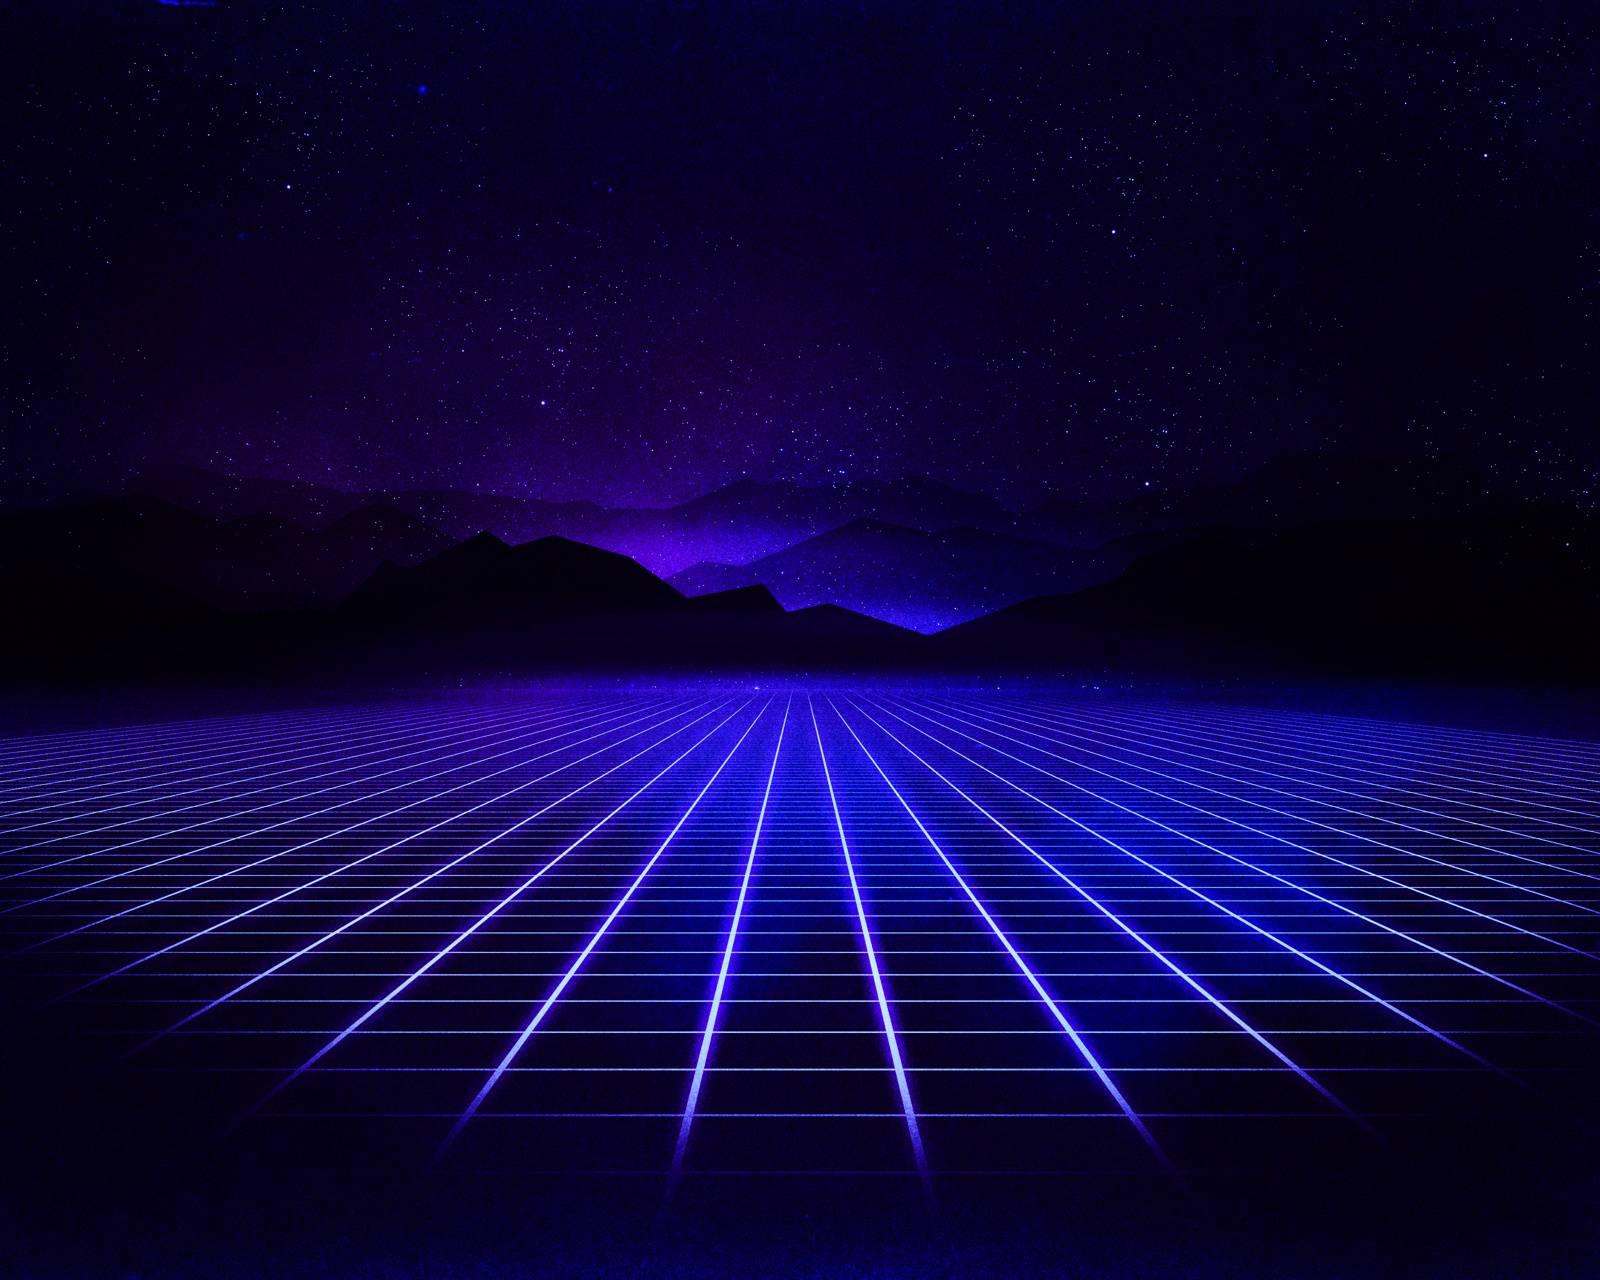 Indigo Neon Grid